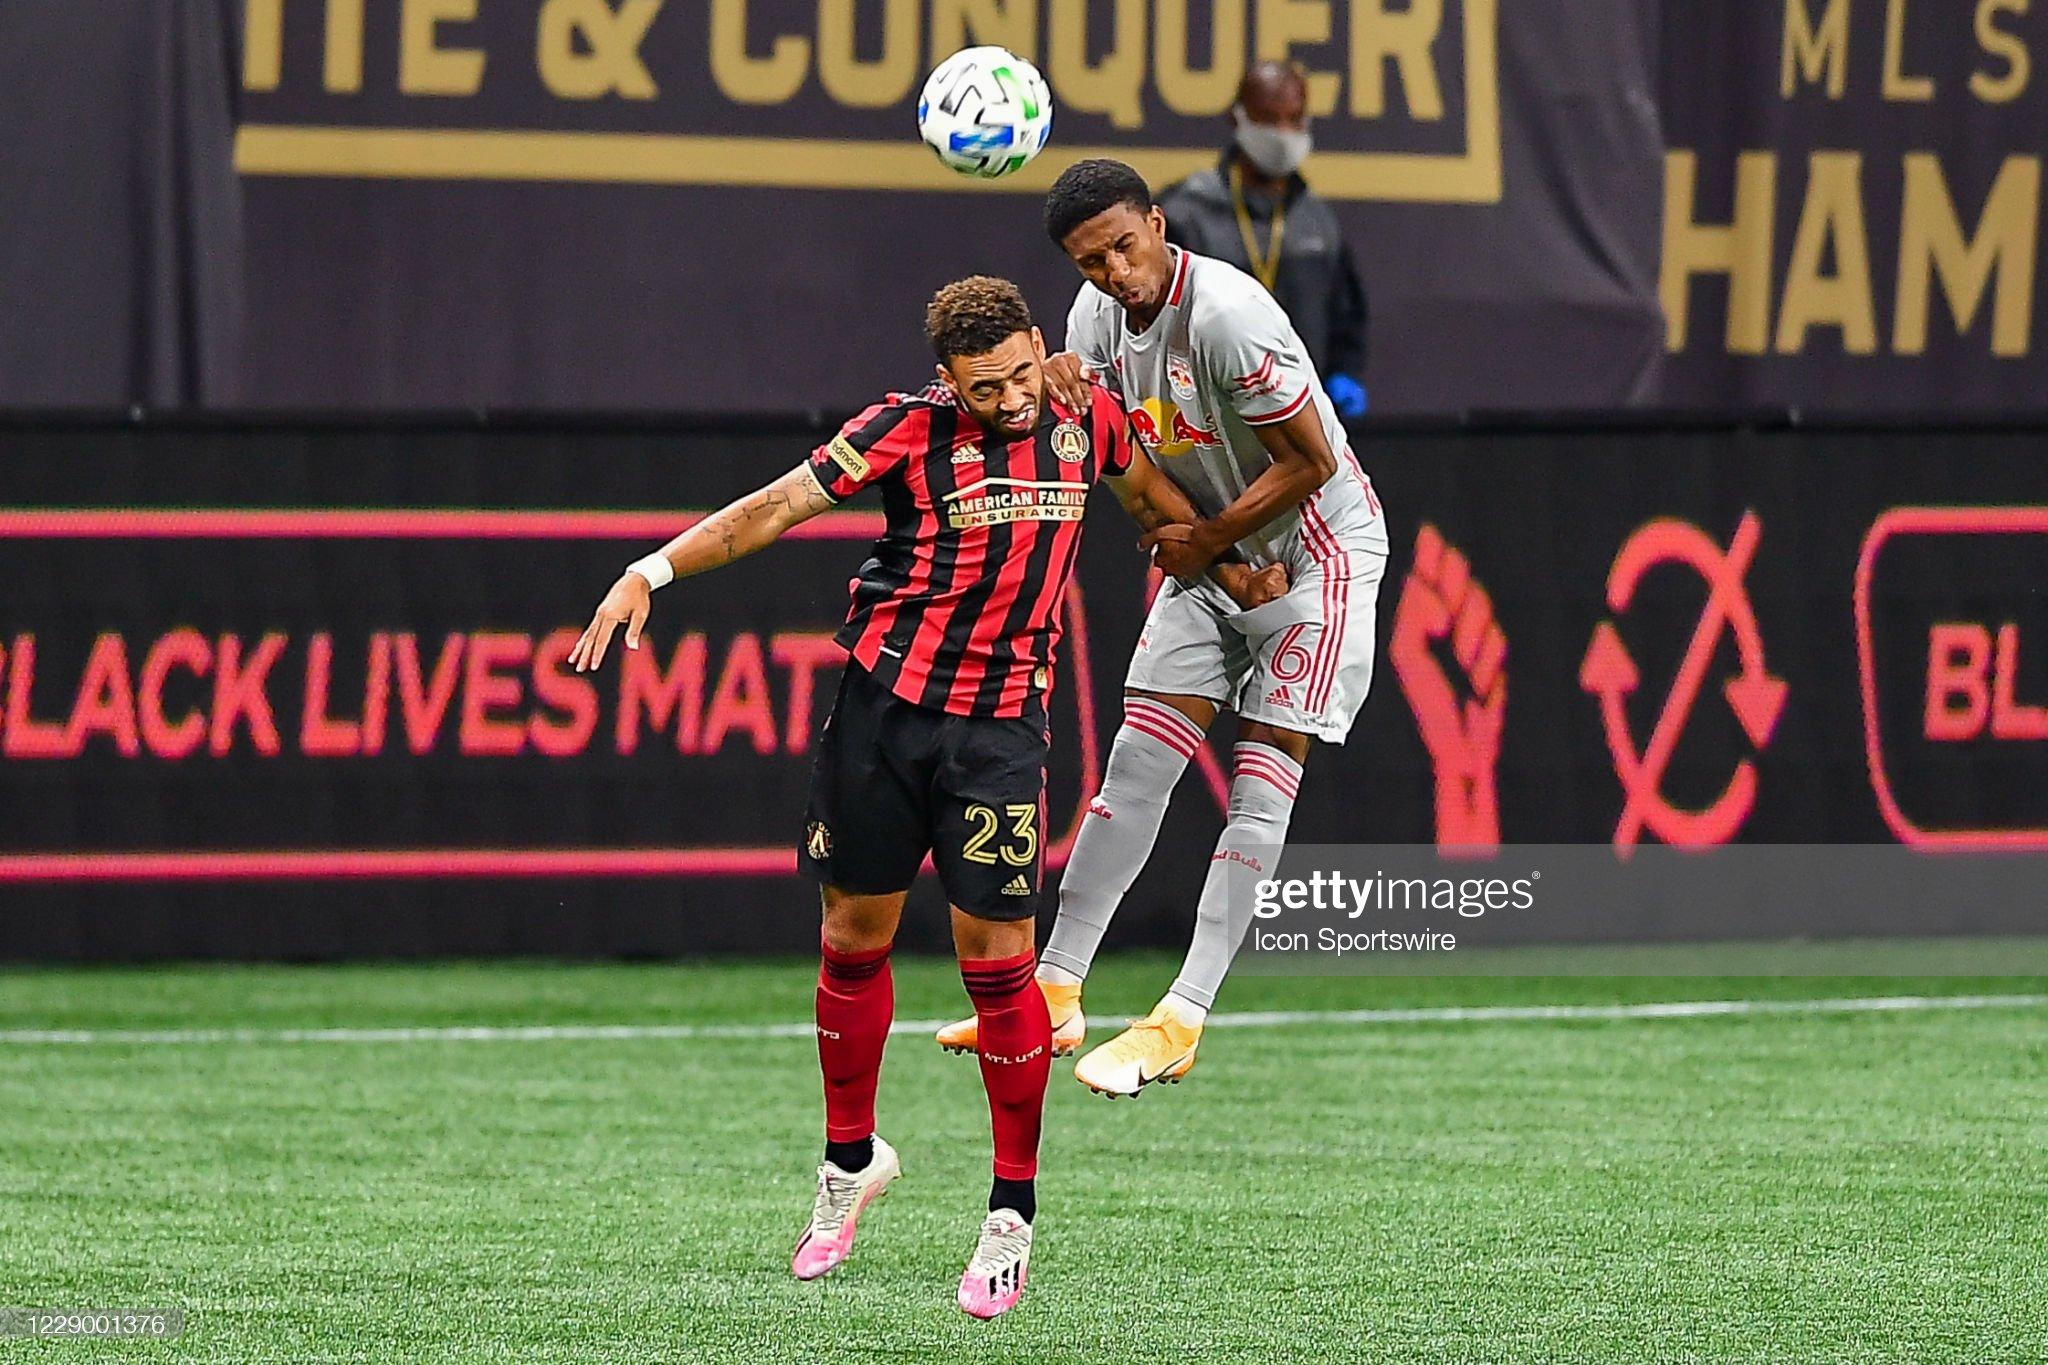 SOCCER: OCT 10 MLS - New York Red Bulls at Atlanta United FC : News Photo